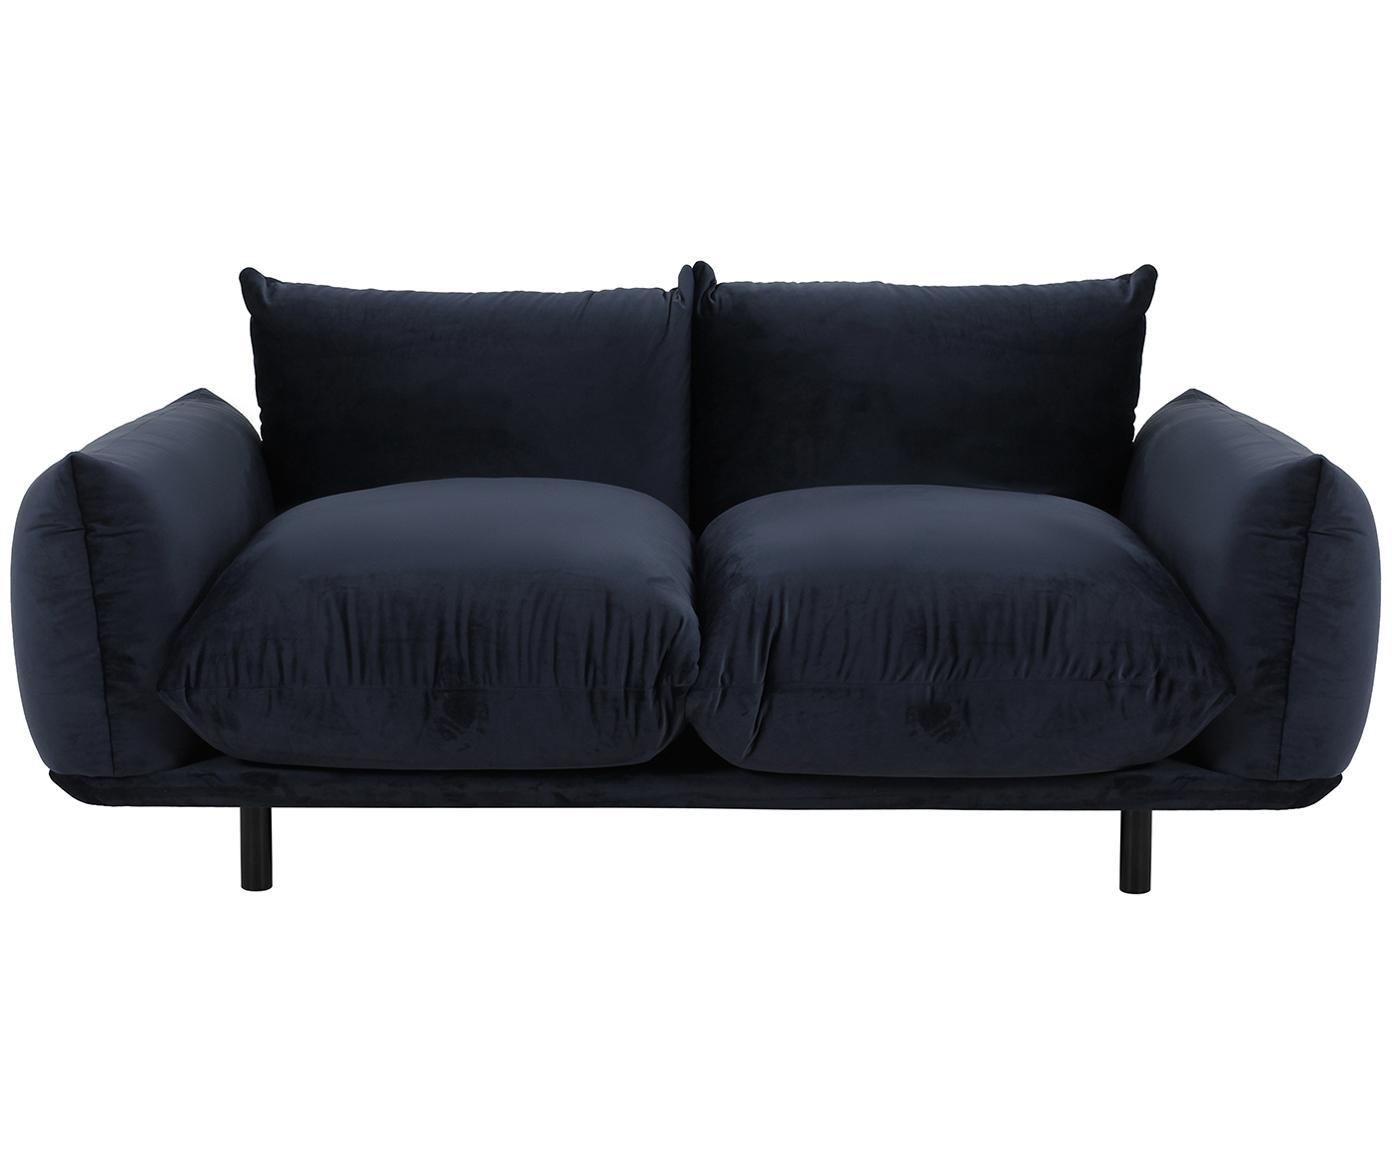 Samt-Sofa Saga (2-Sitzer), Bezug: 100% Polyestersamt 35.000, Gestell: Massives Birkenholz, Füße: Metall, pulverbeschichtet, Samt Dunkelblau, B 170 x T 103 cm